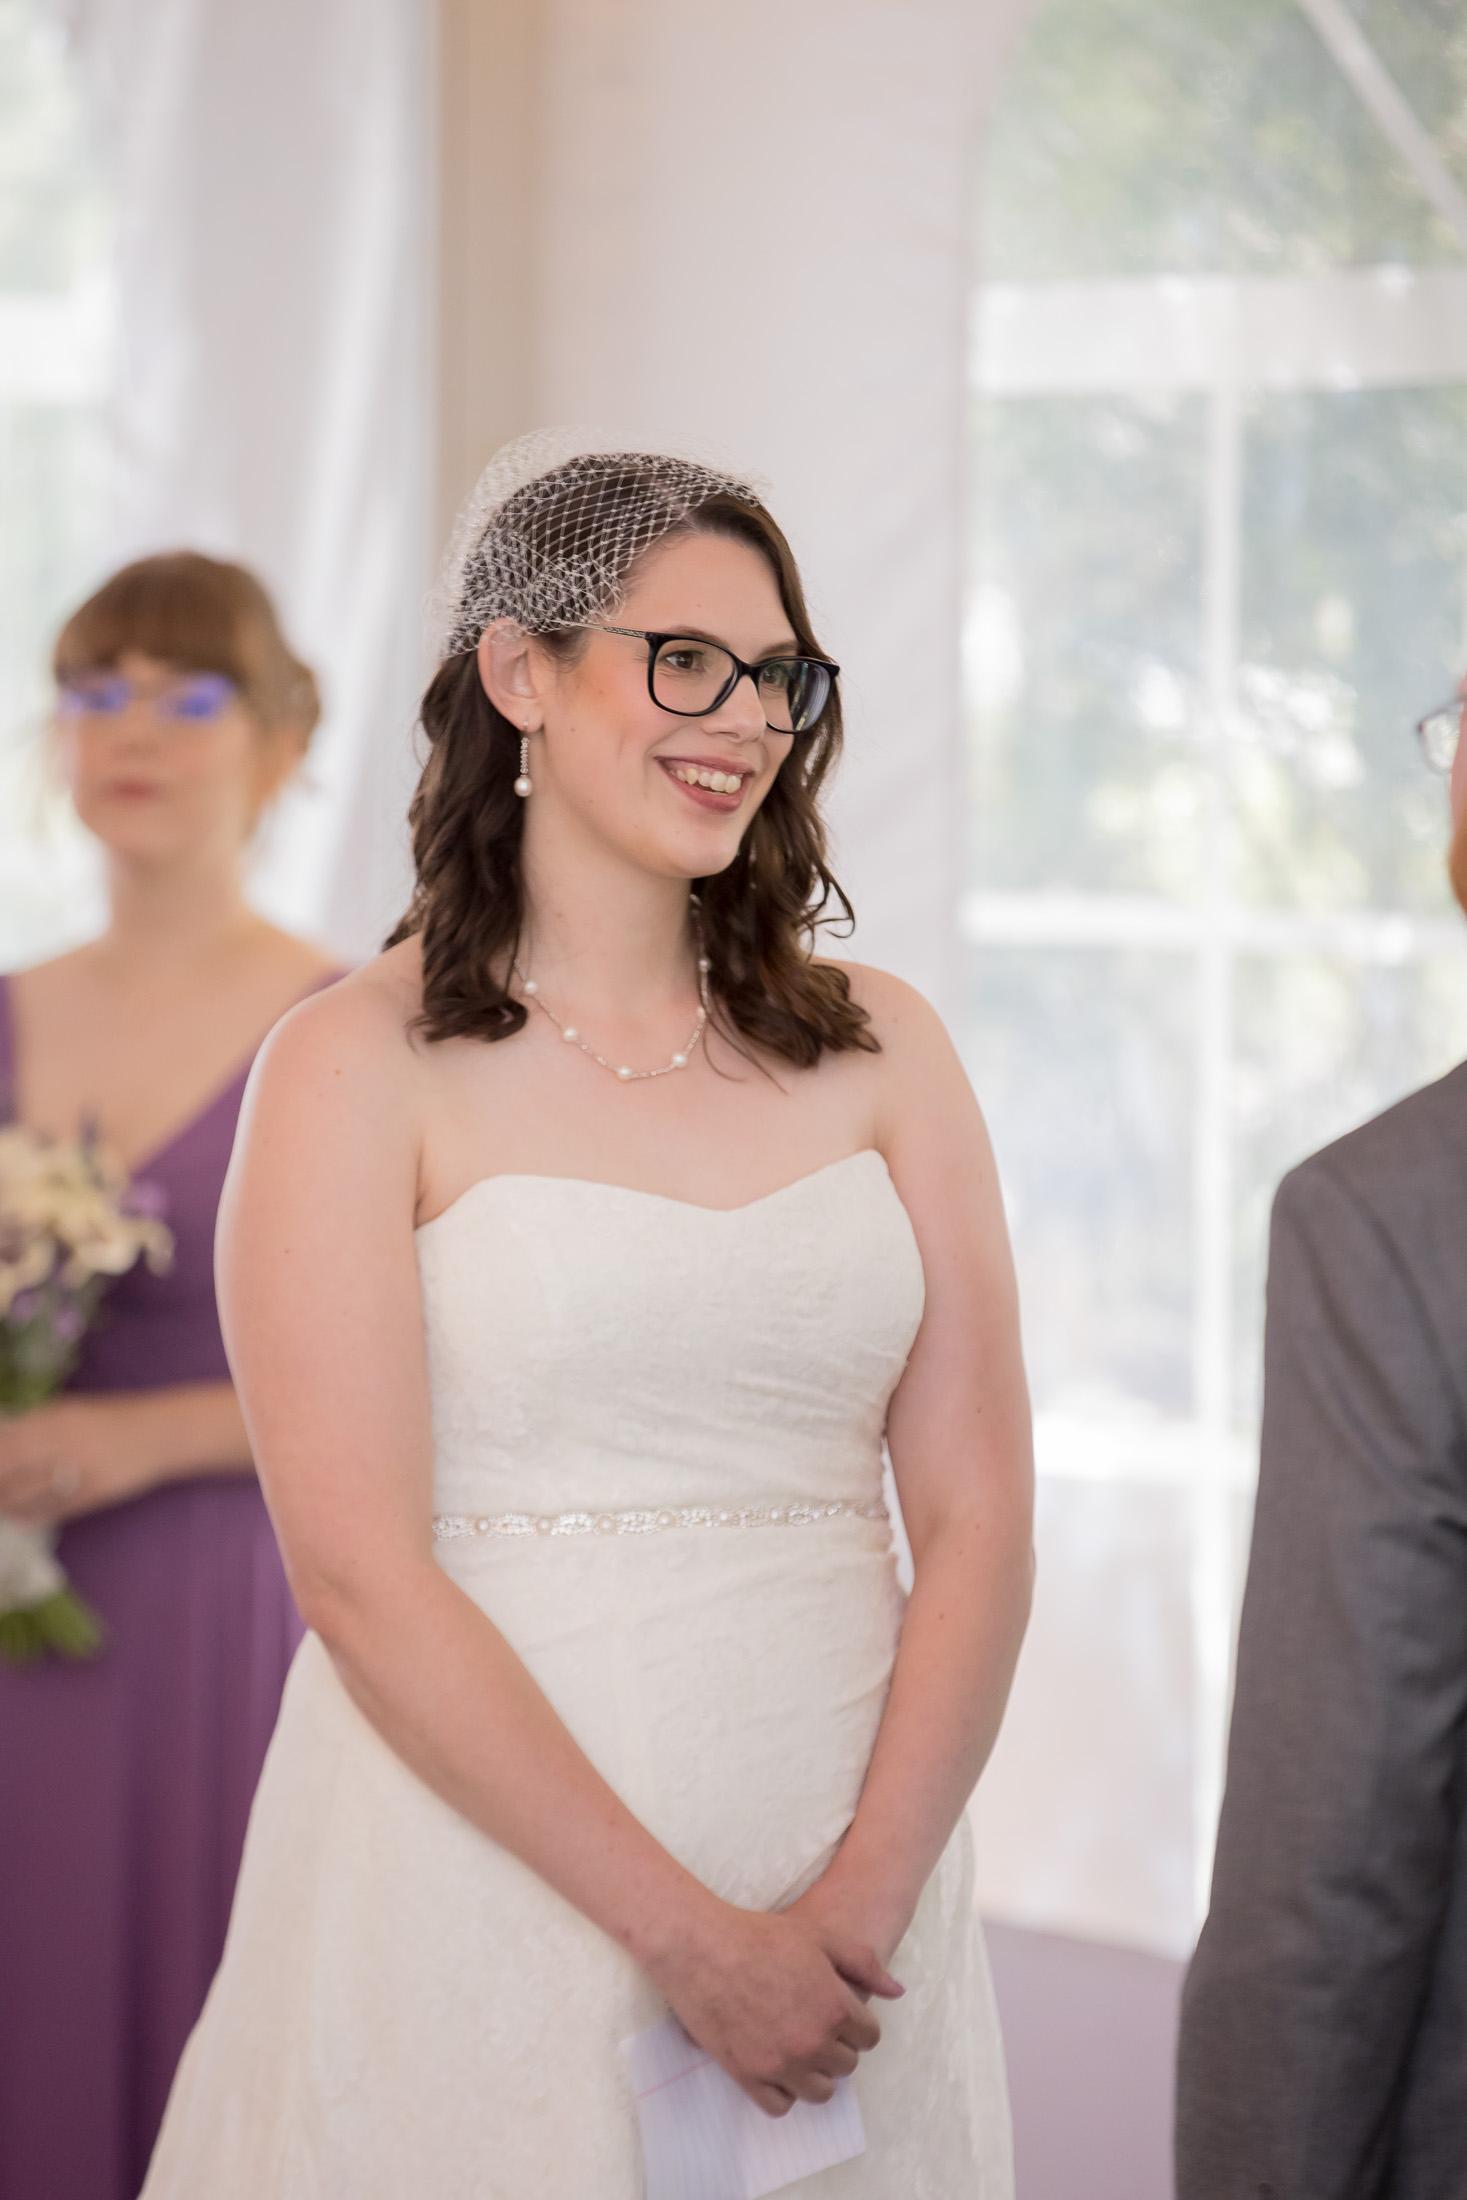 bride, ceremony, wedding, tracy jenkins photography, publick house, Massachusetts, new england,  photography